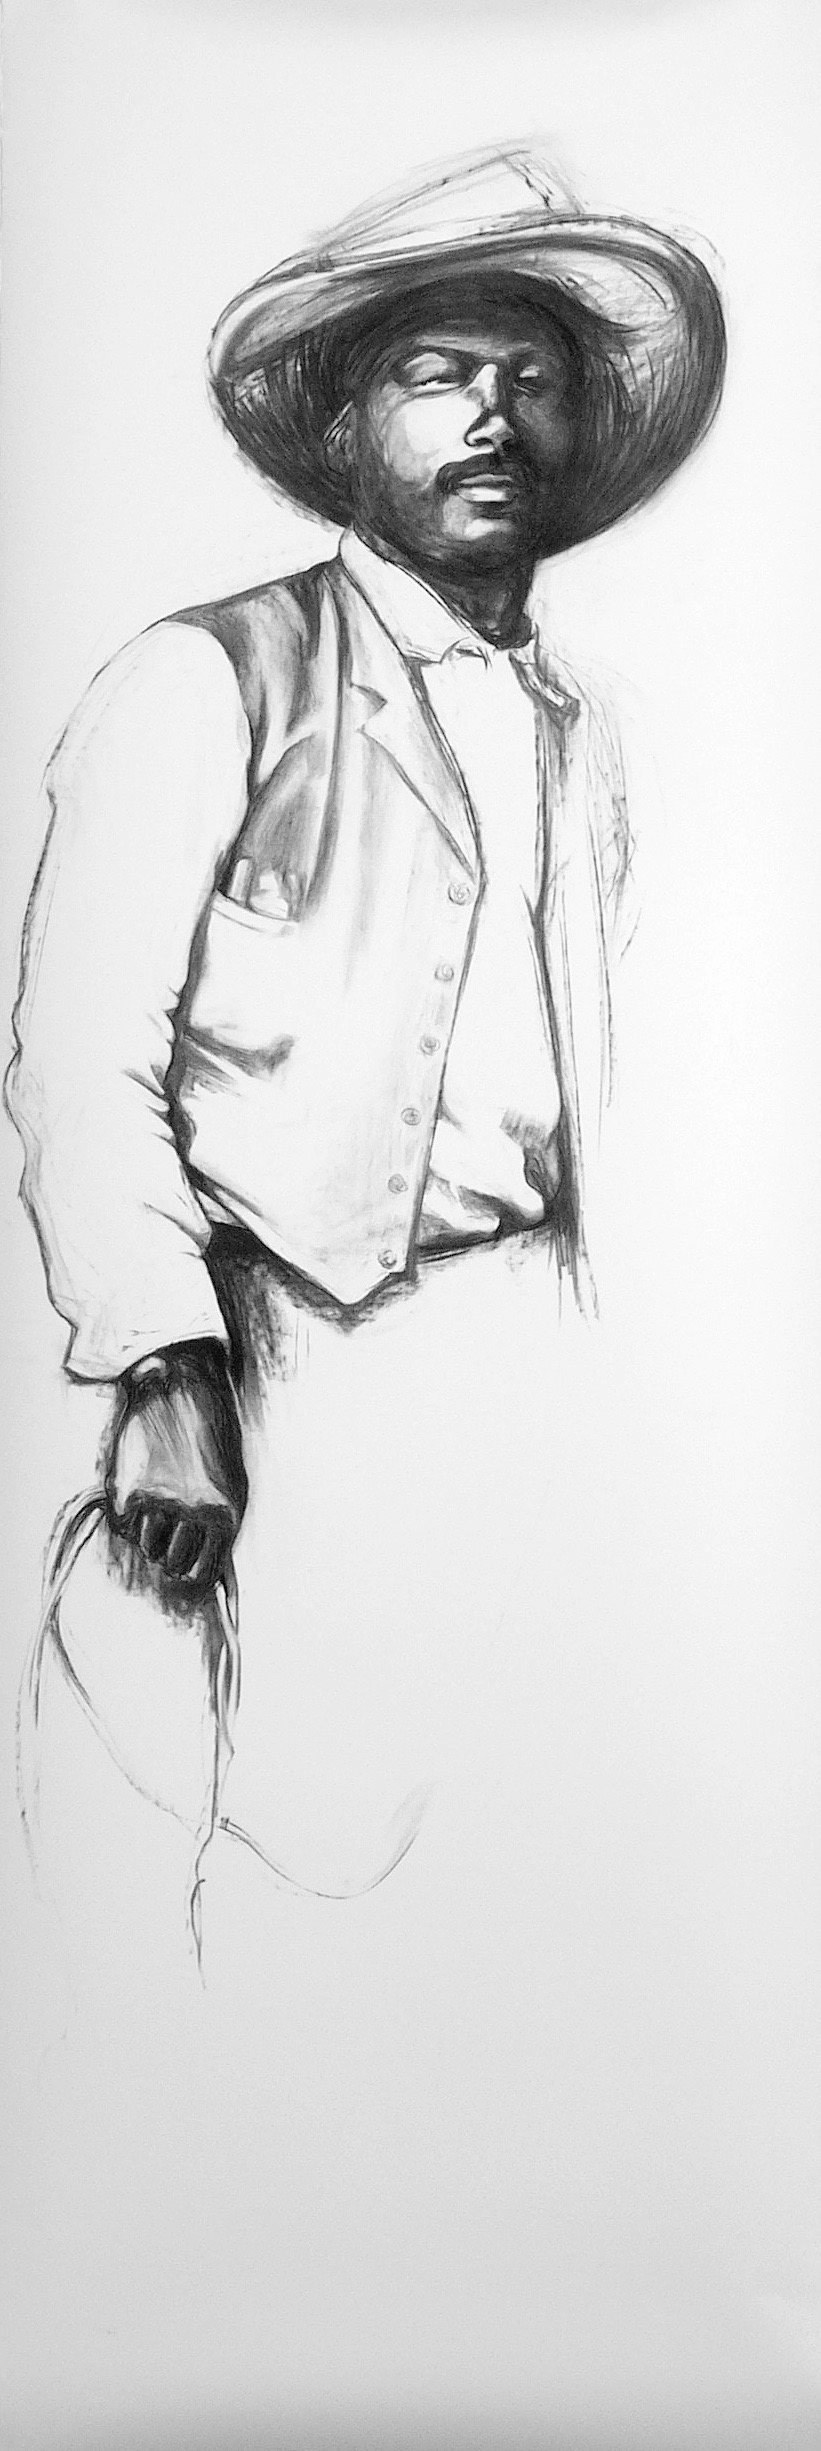 28 Ben Pickett, 2005, Vine charcoal on paper, 89 x 31 in..jpg